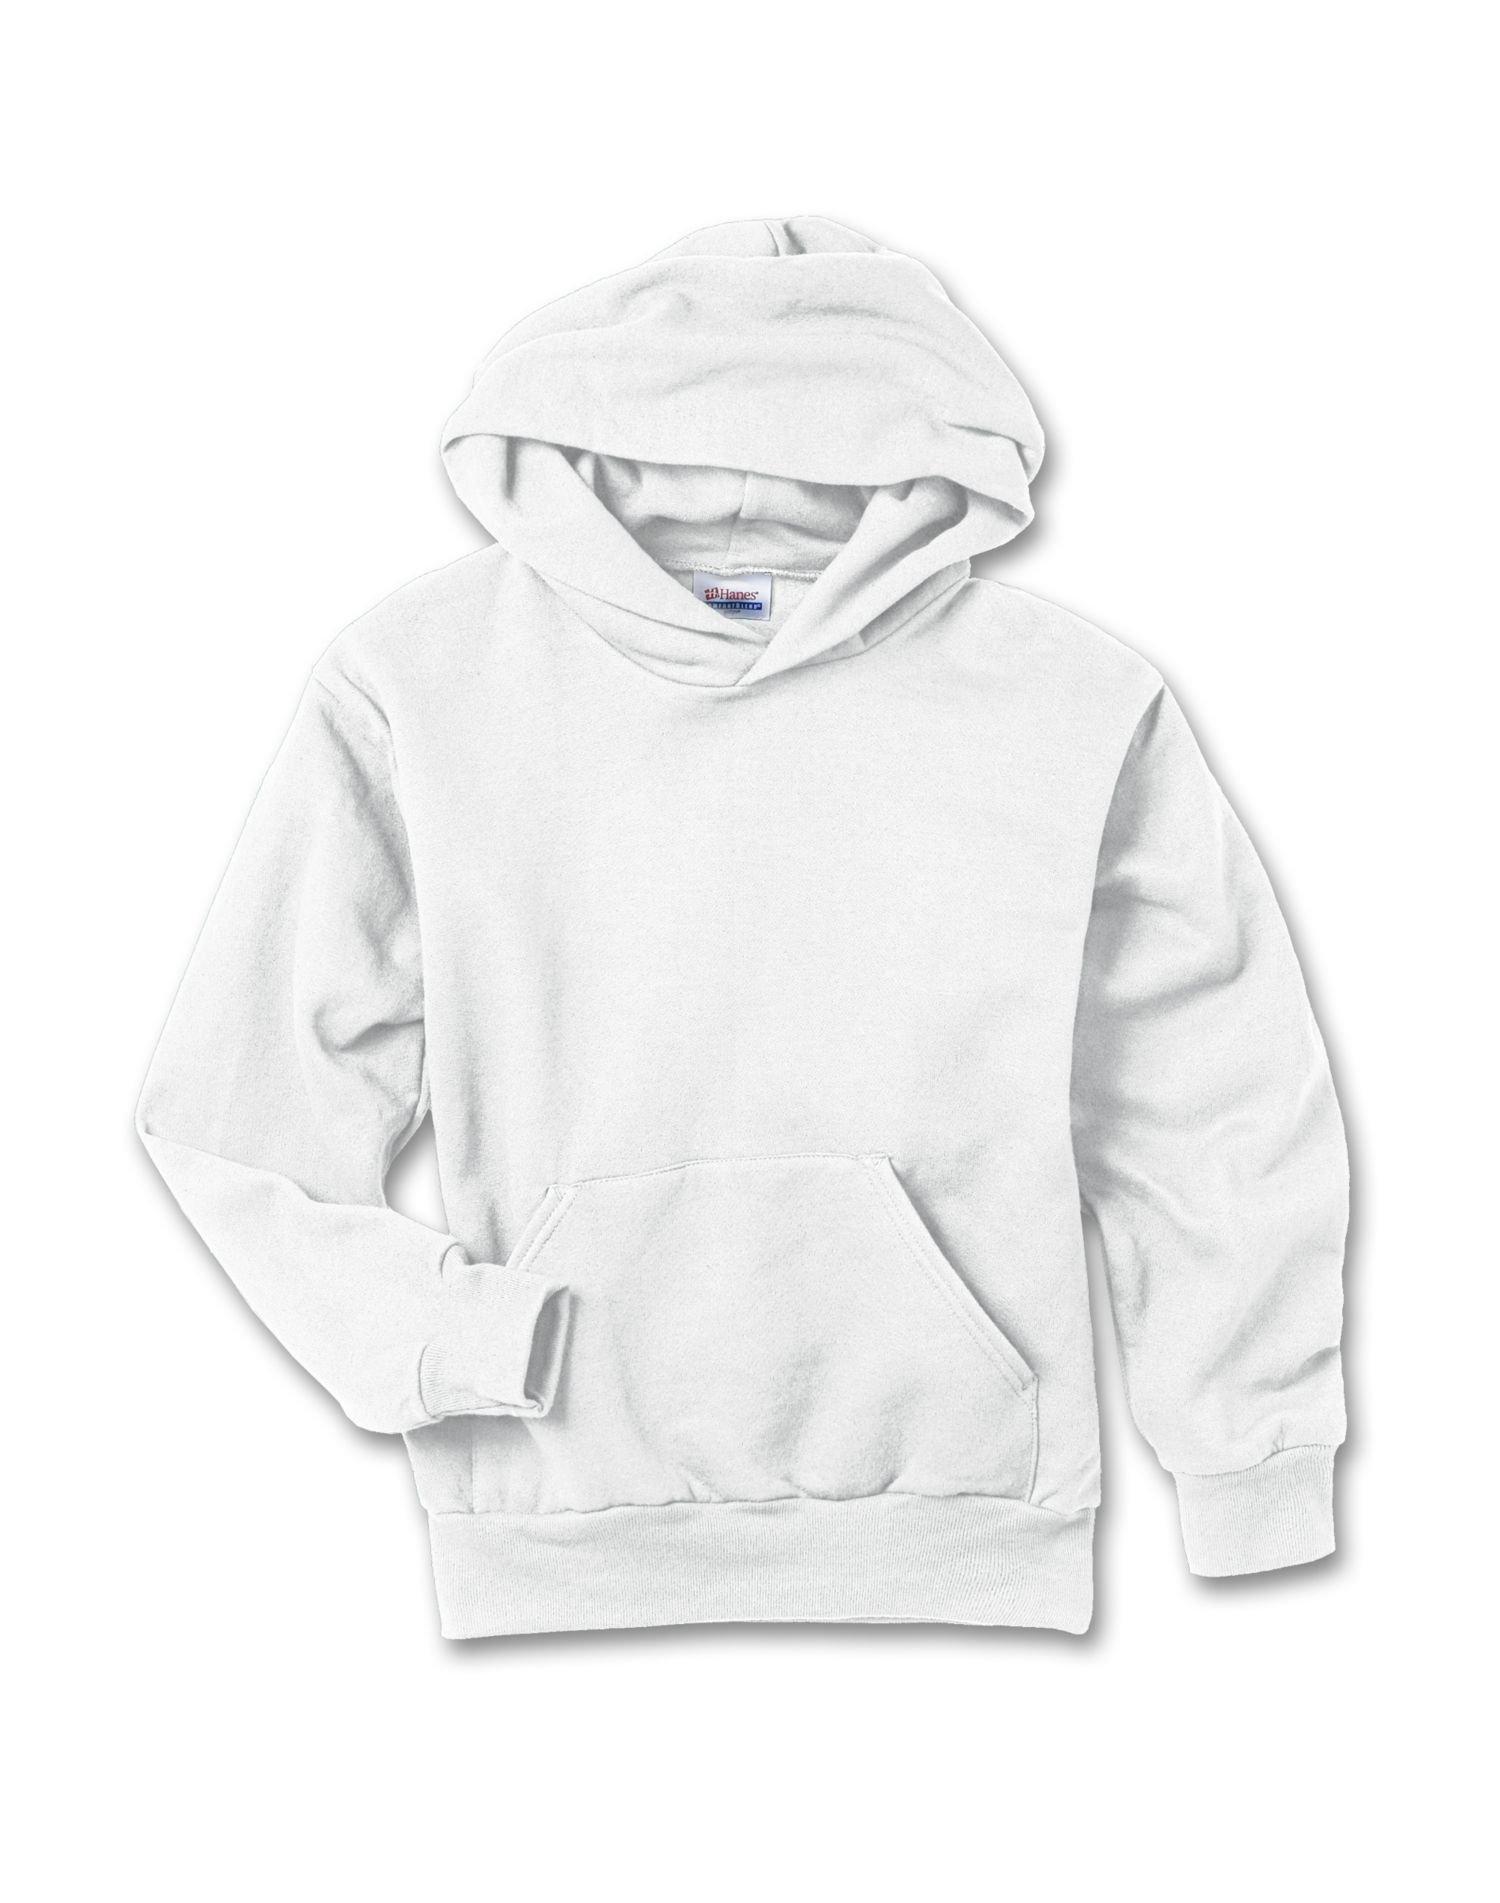 Hanes 7.8 oz Youth COMFORTBLEND EcoSmart Fleece Pullover Hood, White, Medium